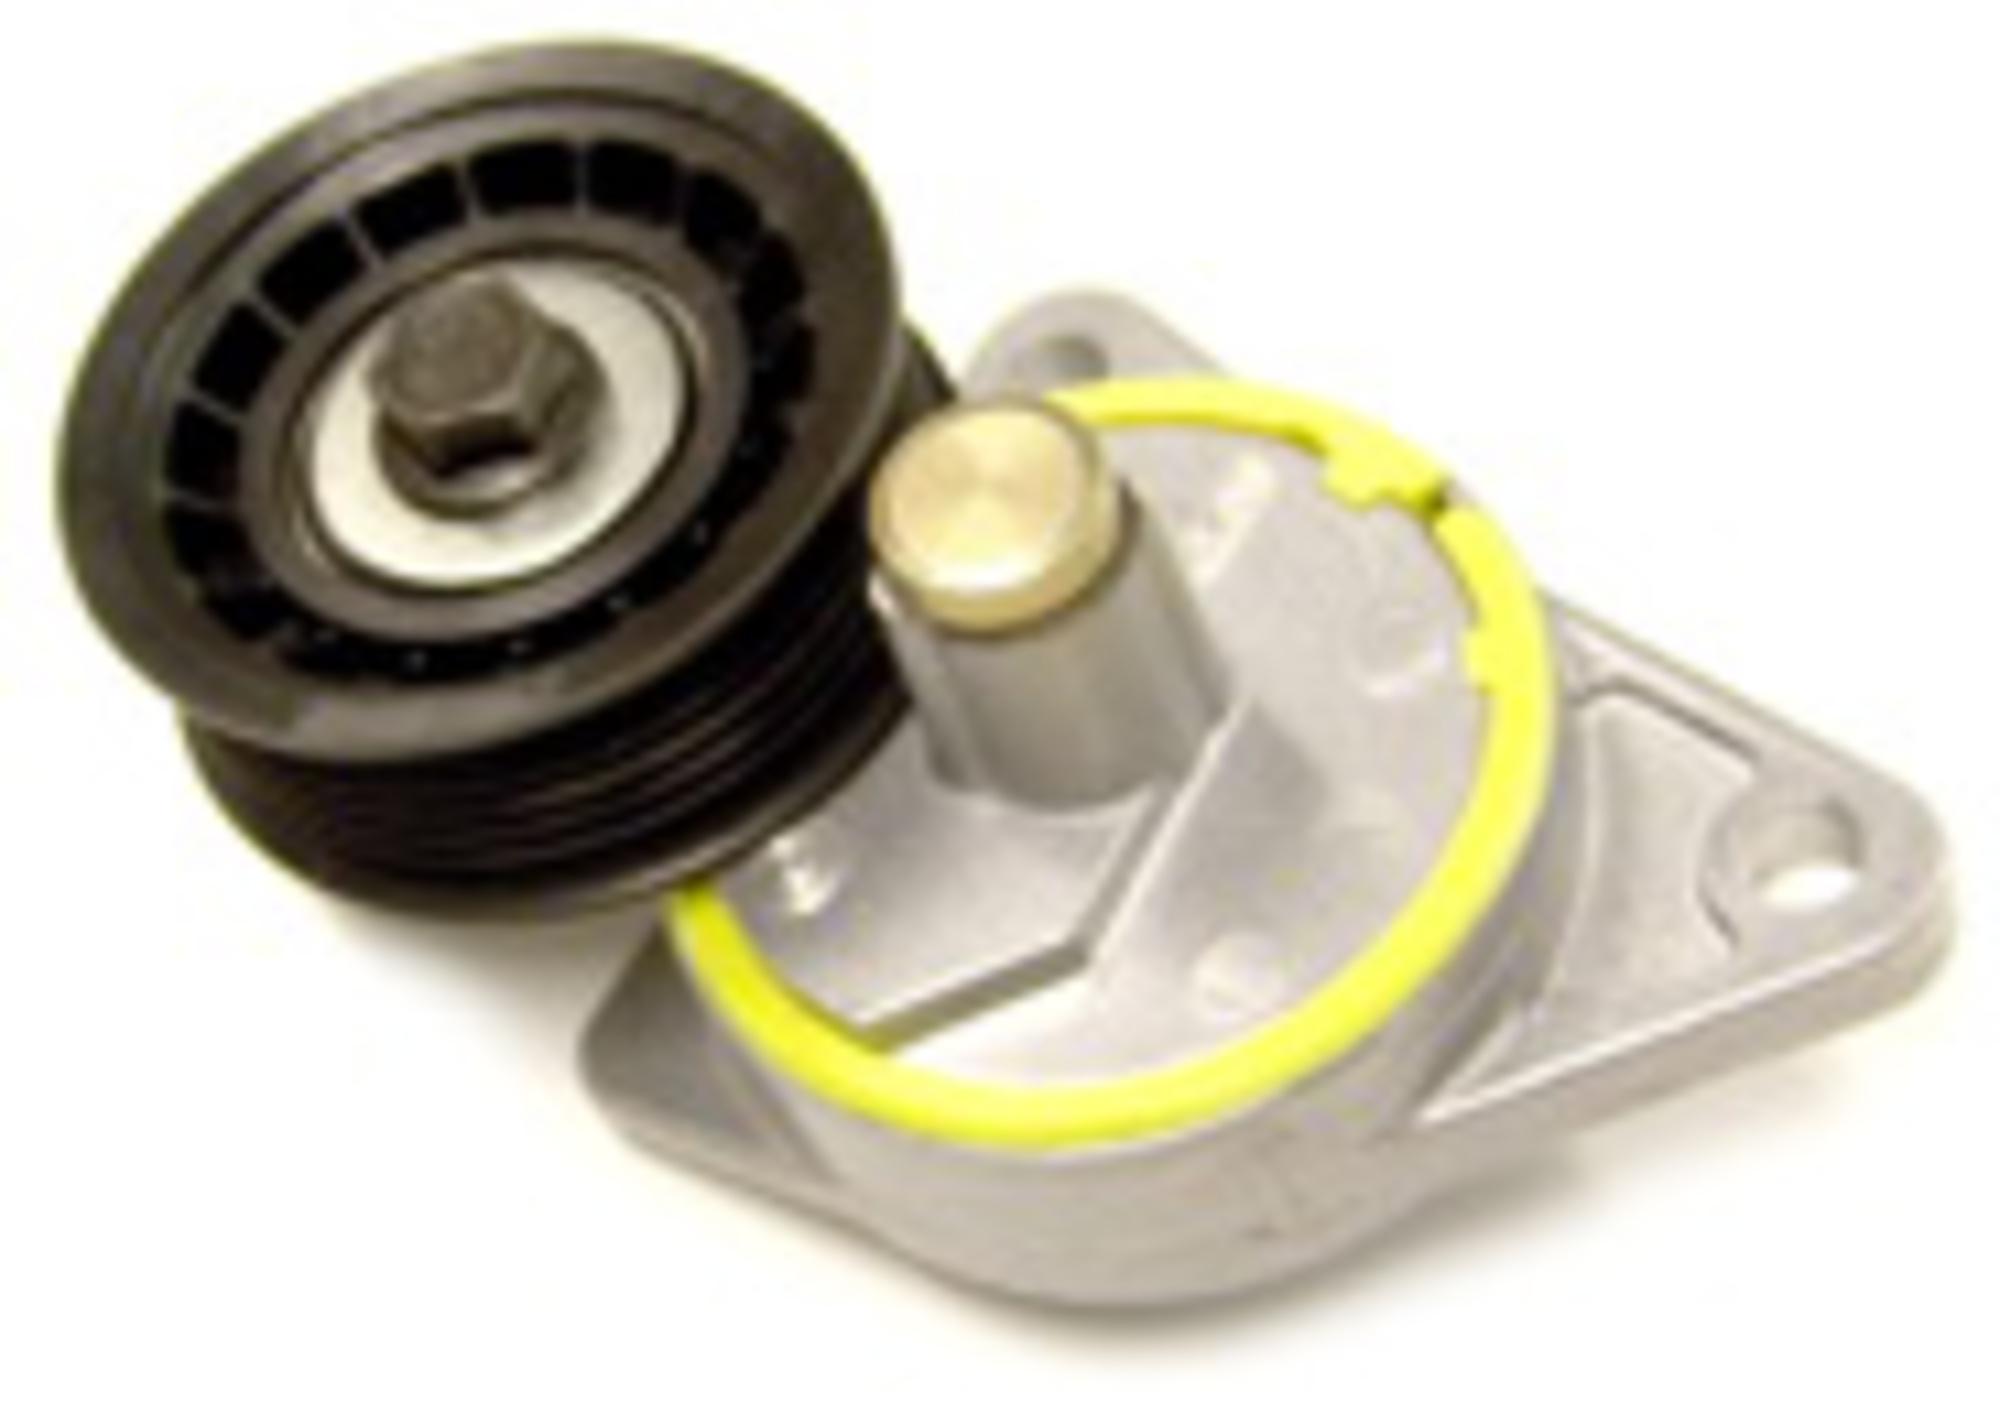 ina cambelt /& tendeur kit Escort RS Turbo 1.6 Turbo gates